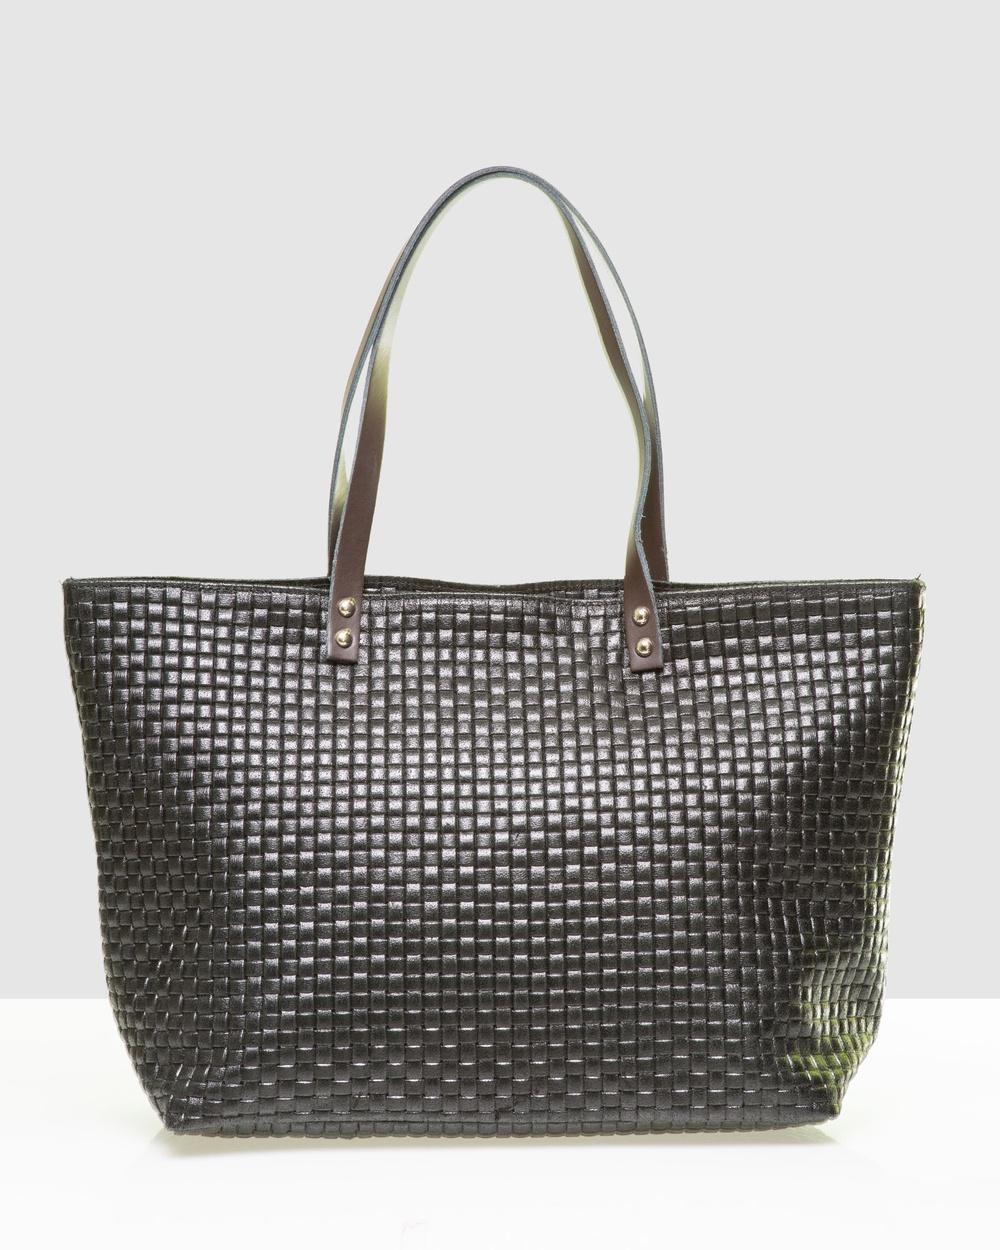 Marlafiji Valerie Shopper Bags Black Leather bags Australia